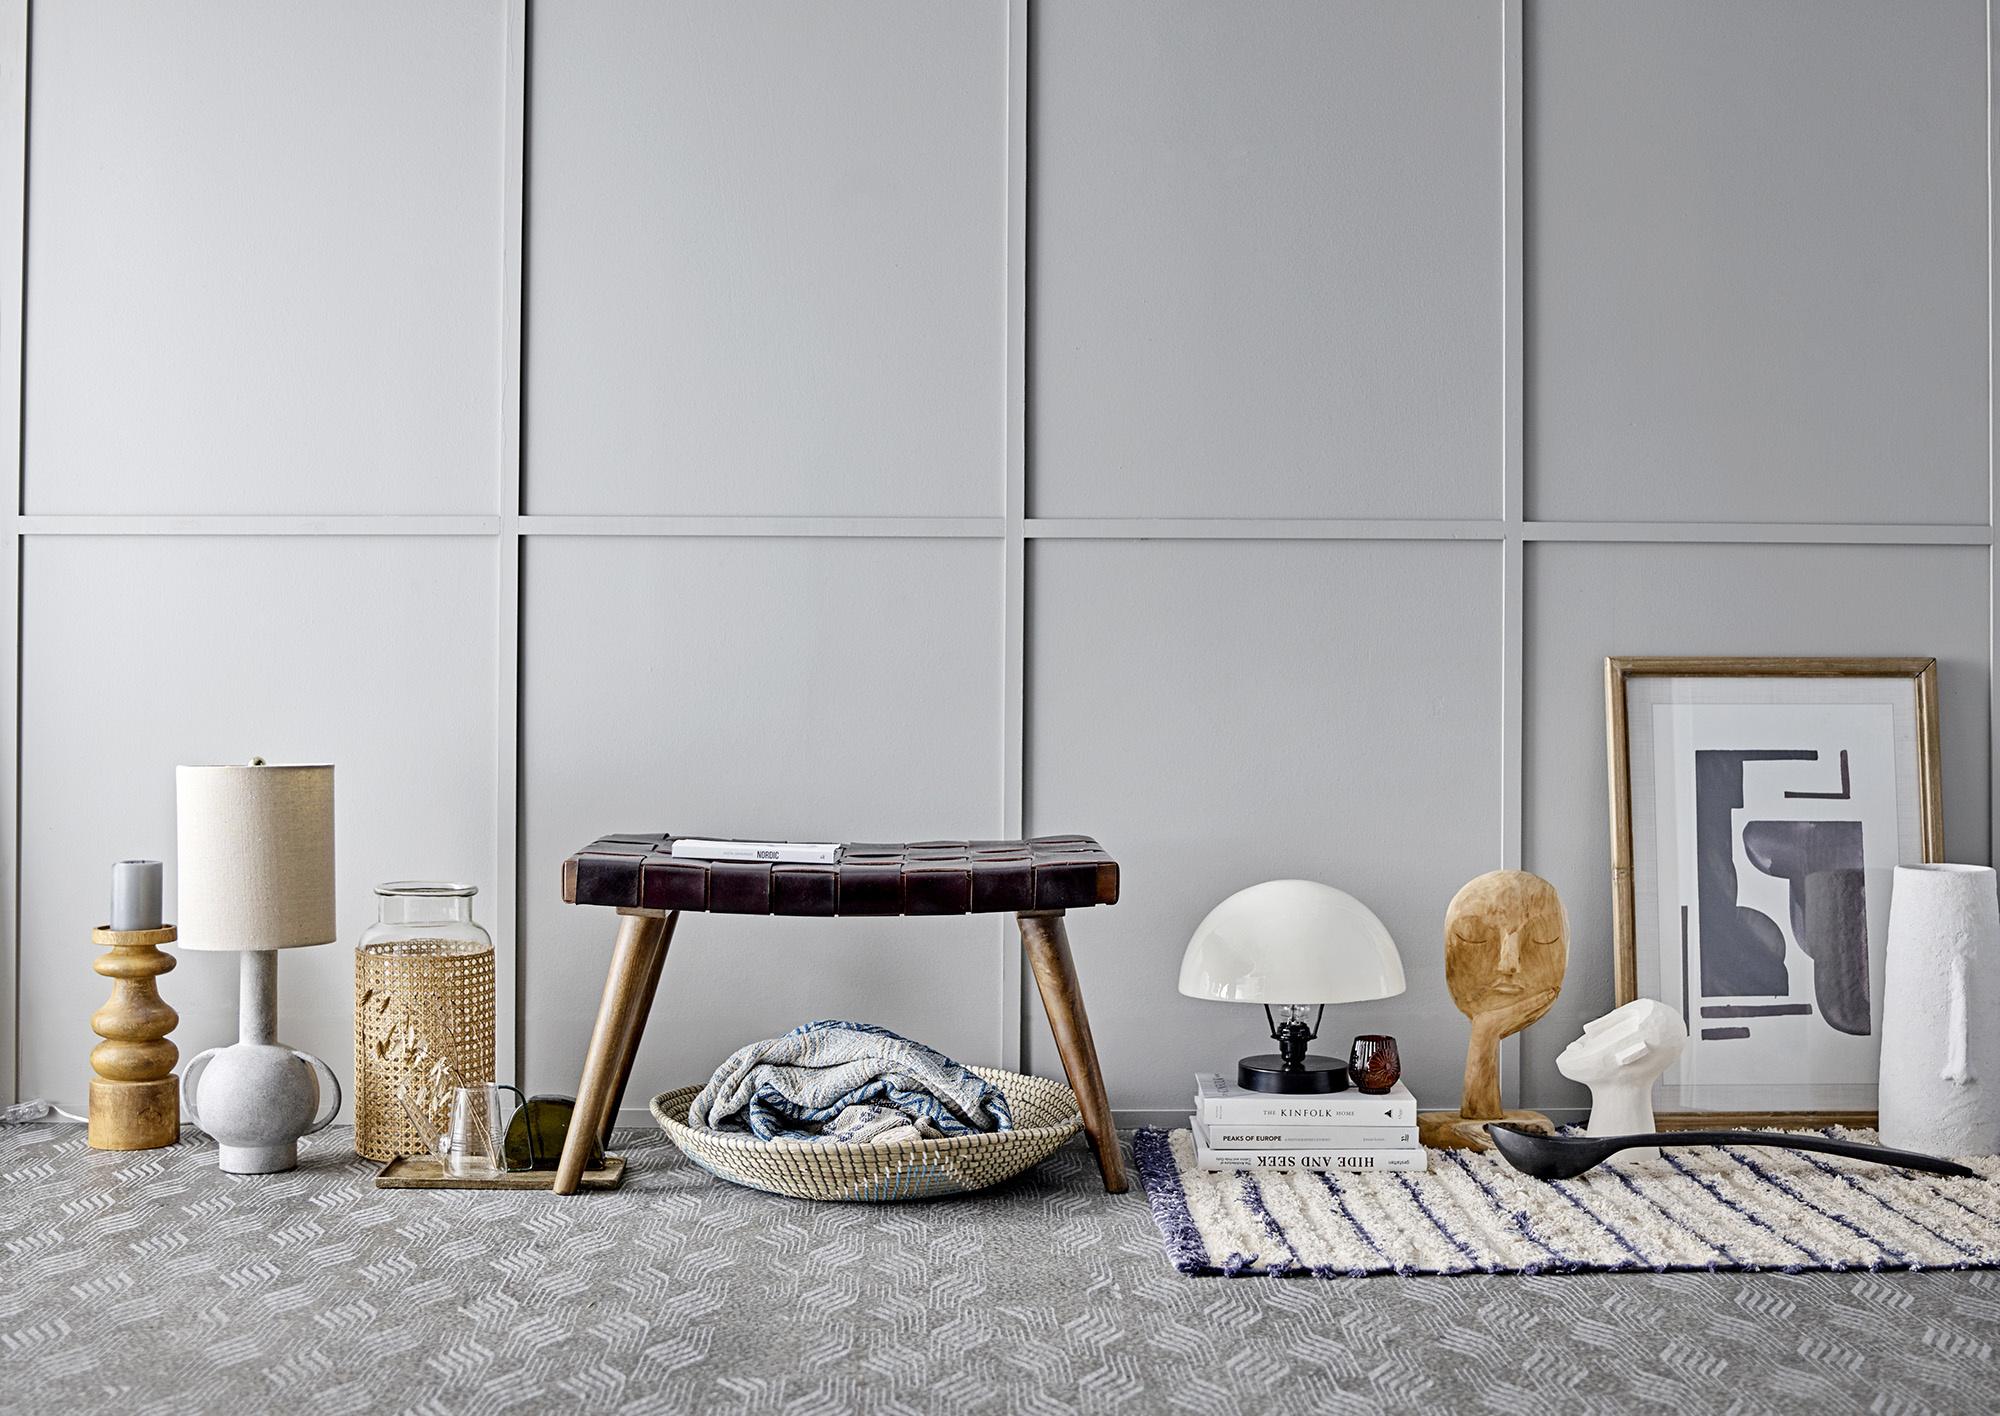 Bloomingville Terracotta & Linen Table Lamp - gres - Ø30,5xH58,5cm - Bloomingville